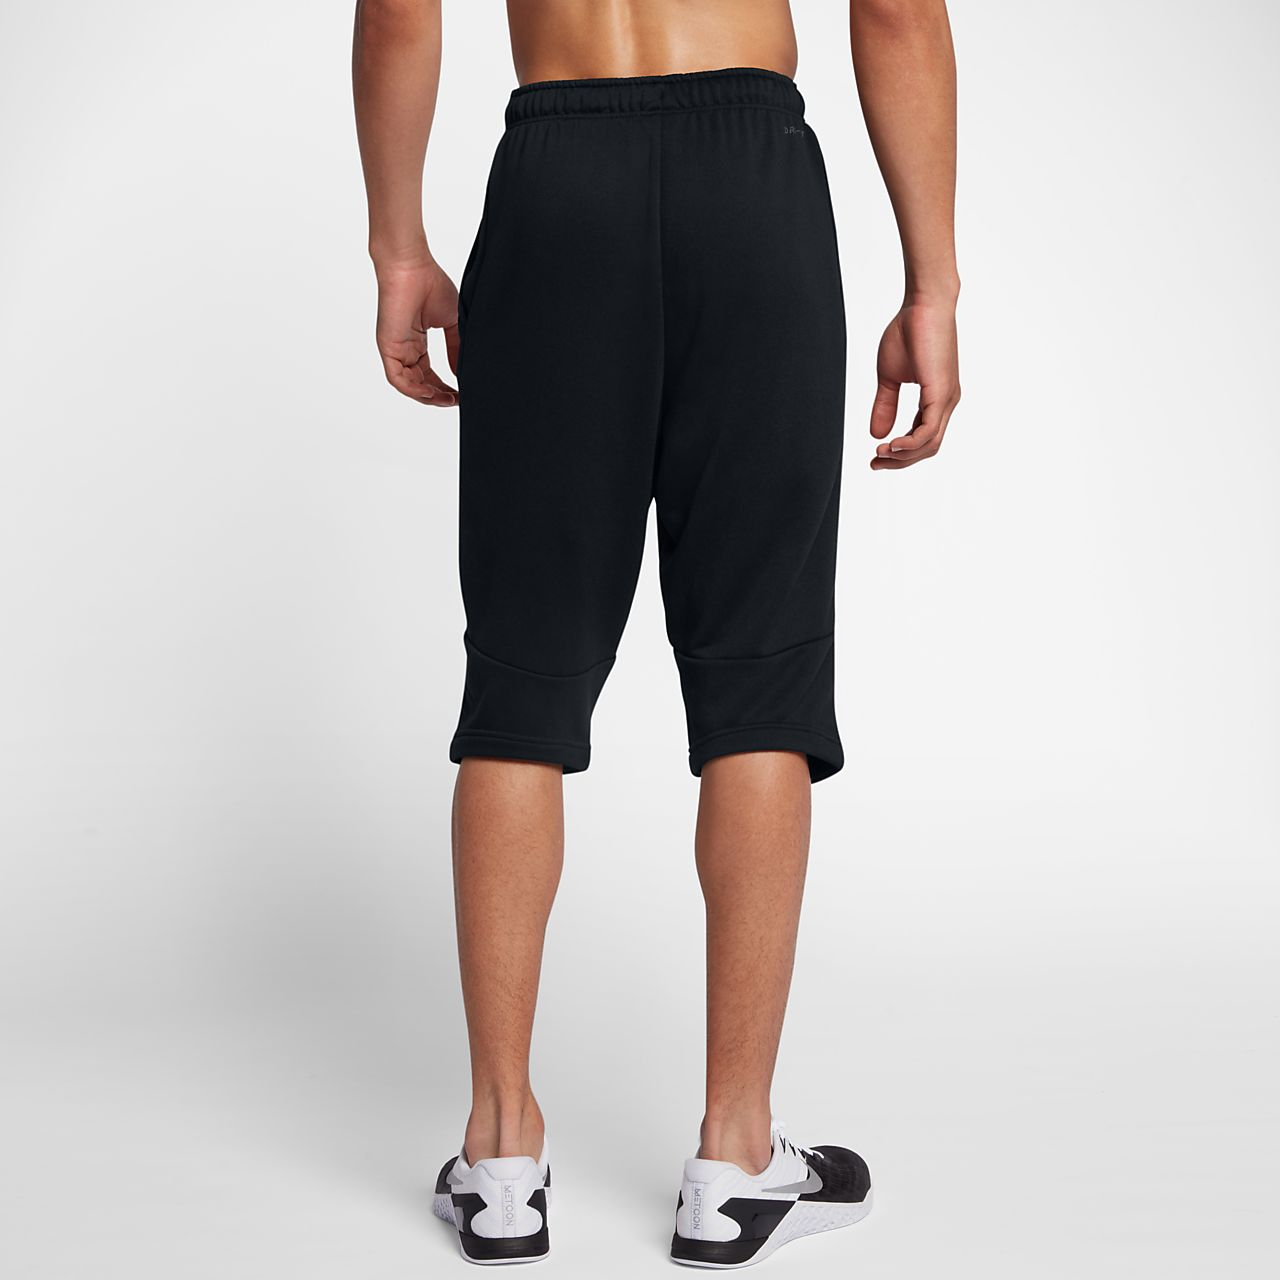 nike mens dri-fit fleece shorts